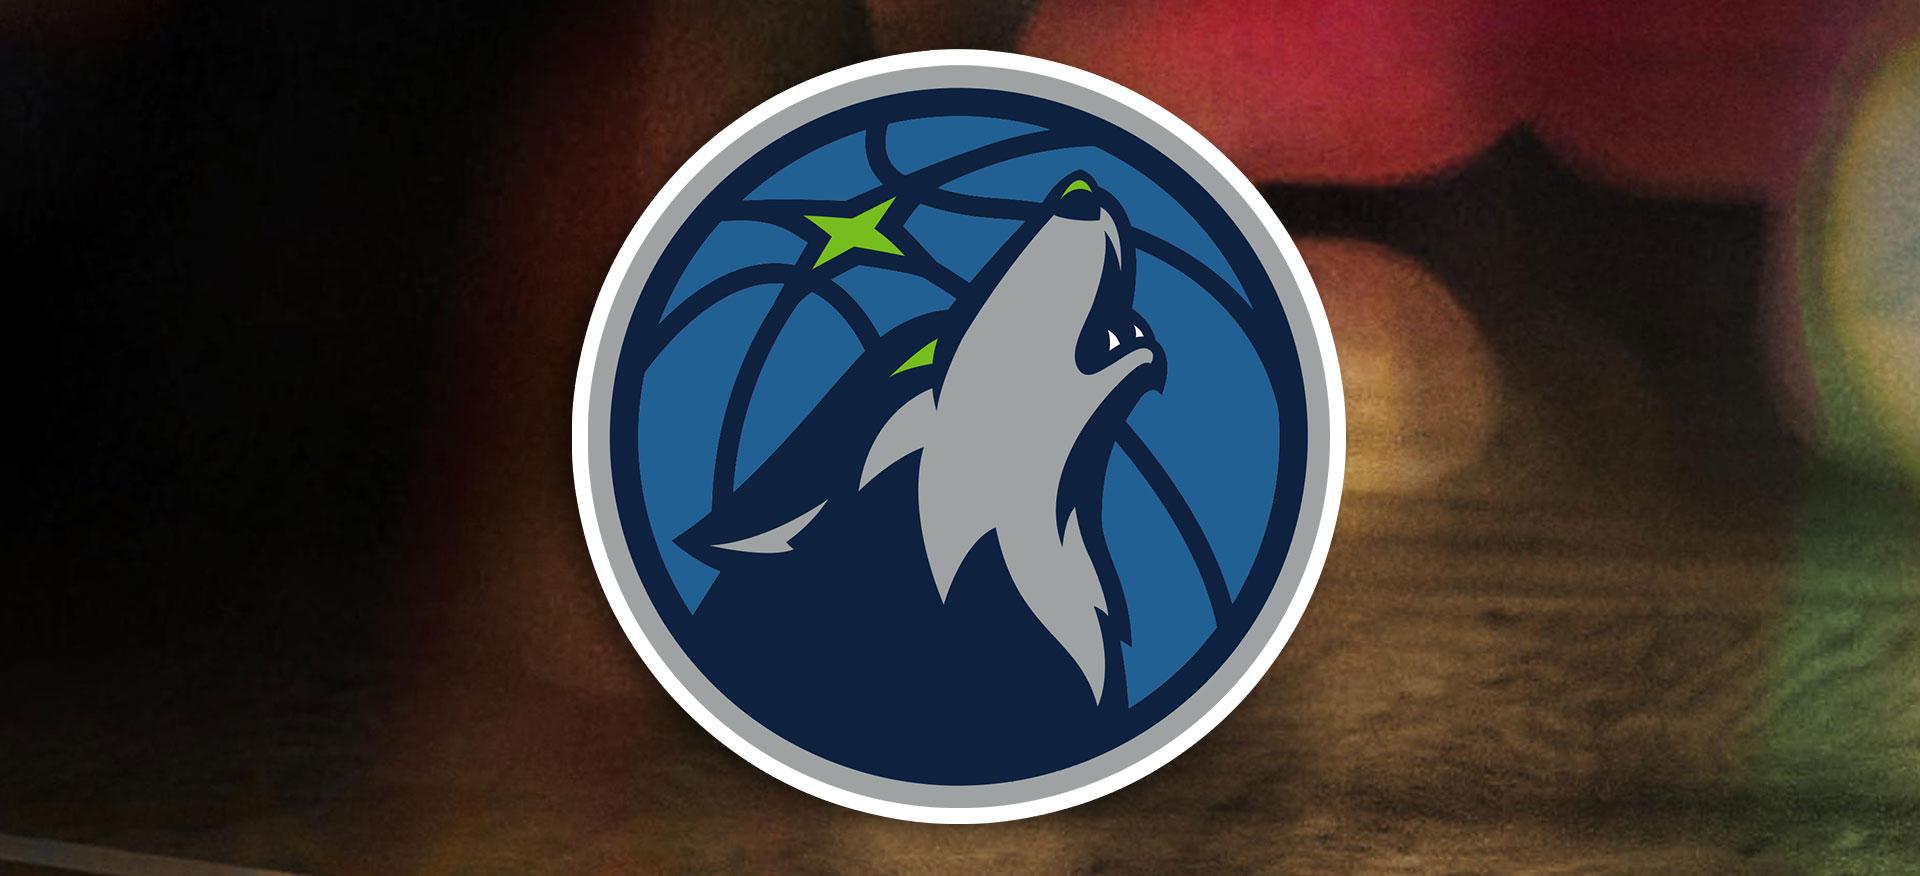 MInnesota Timberwolves Minnesota T-Wolves